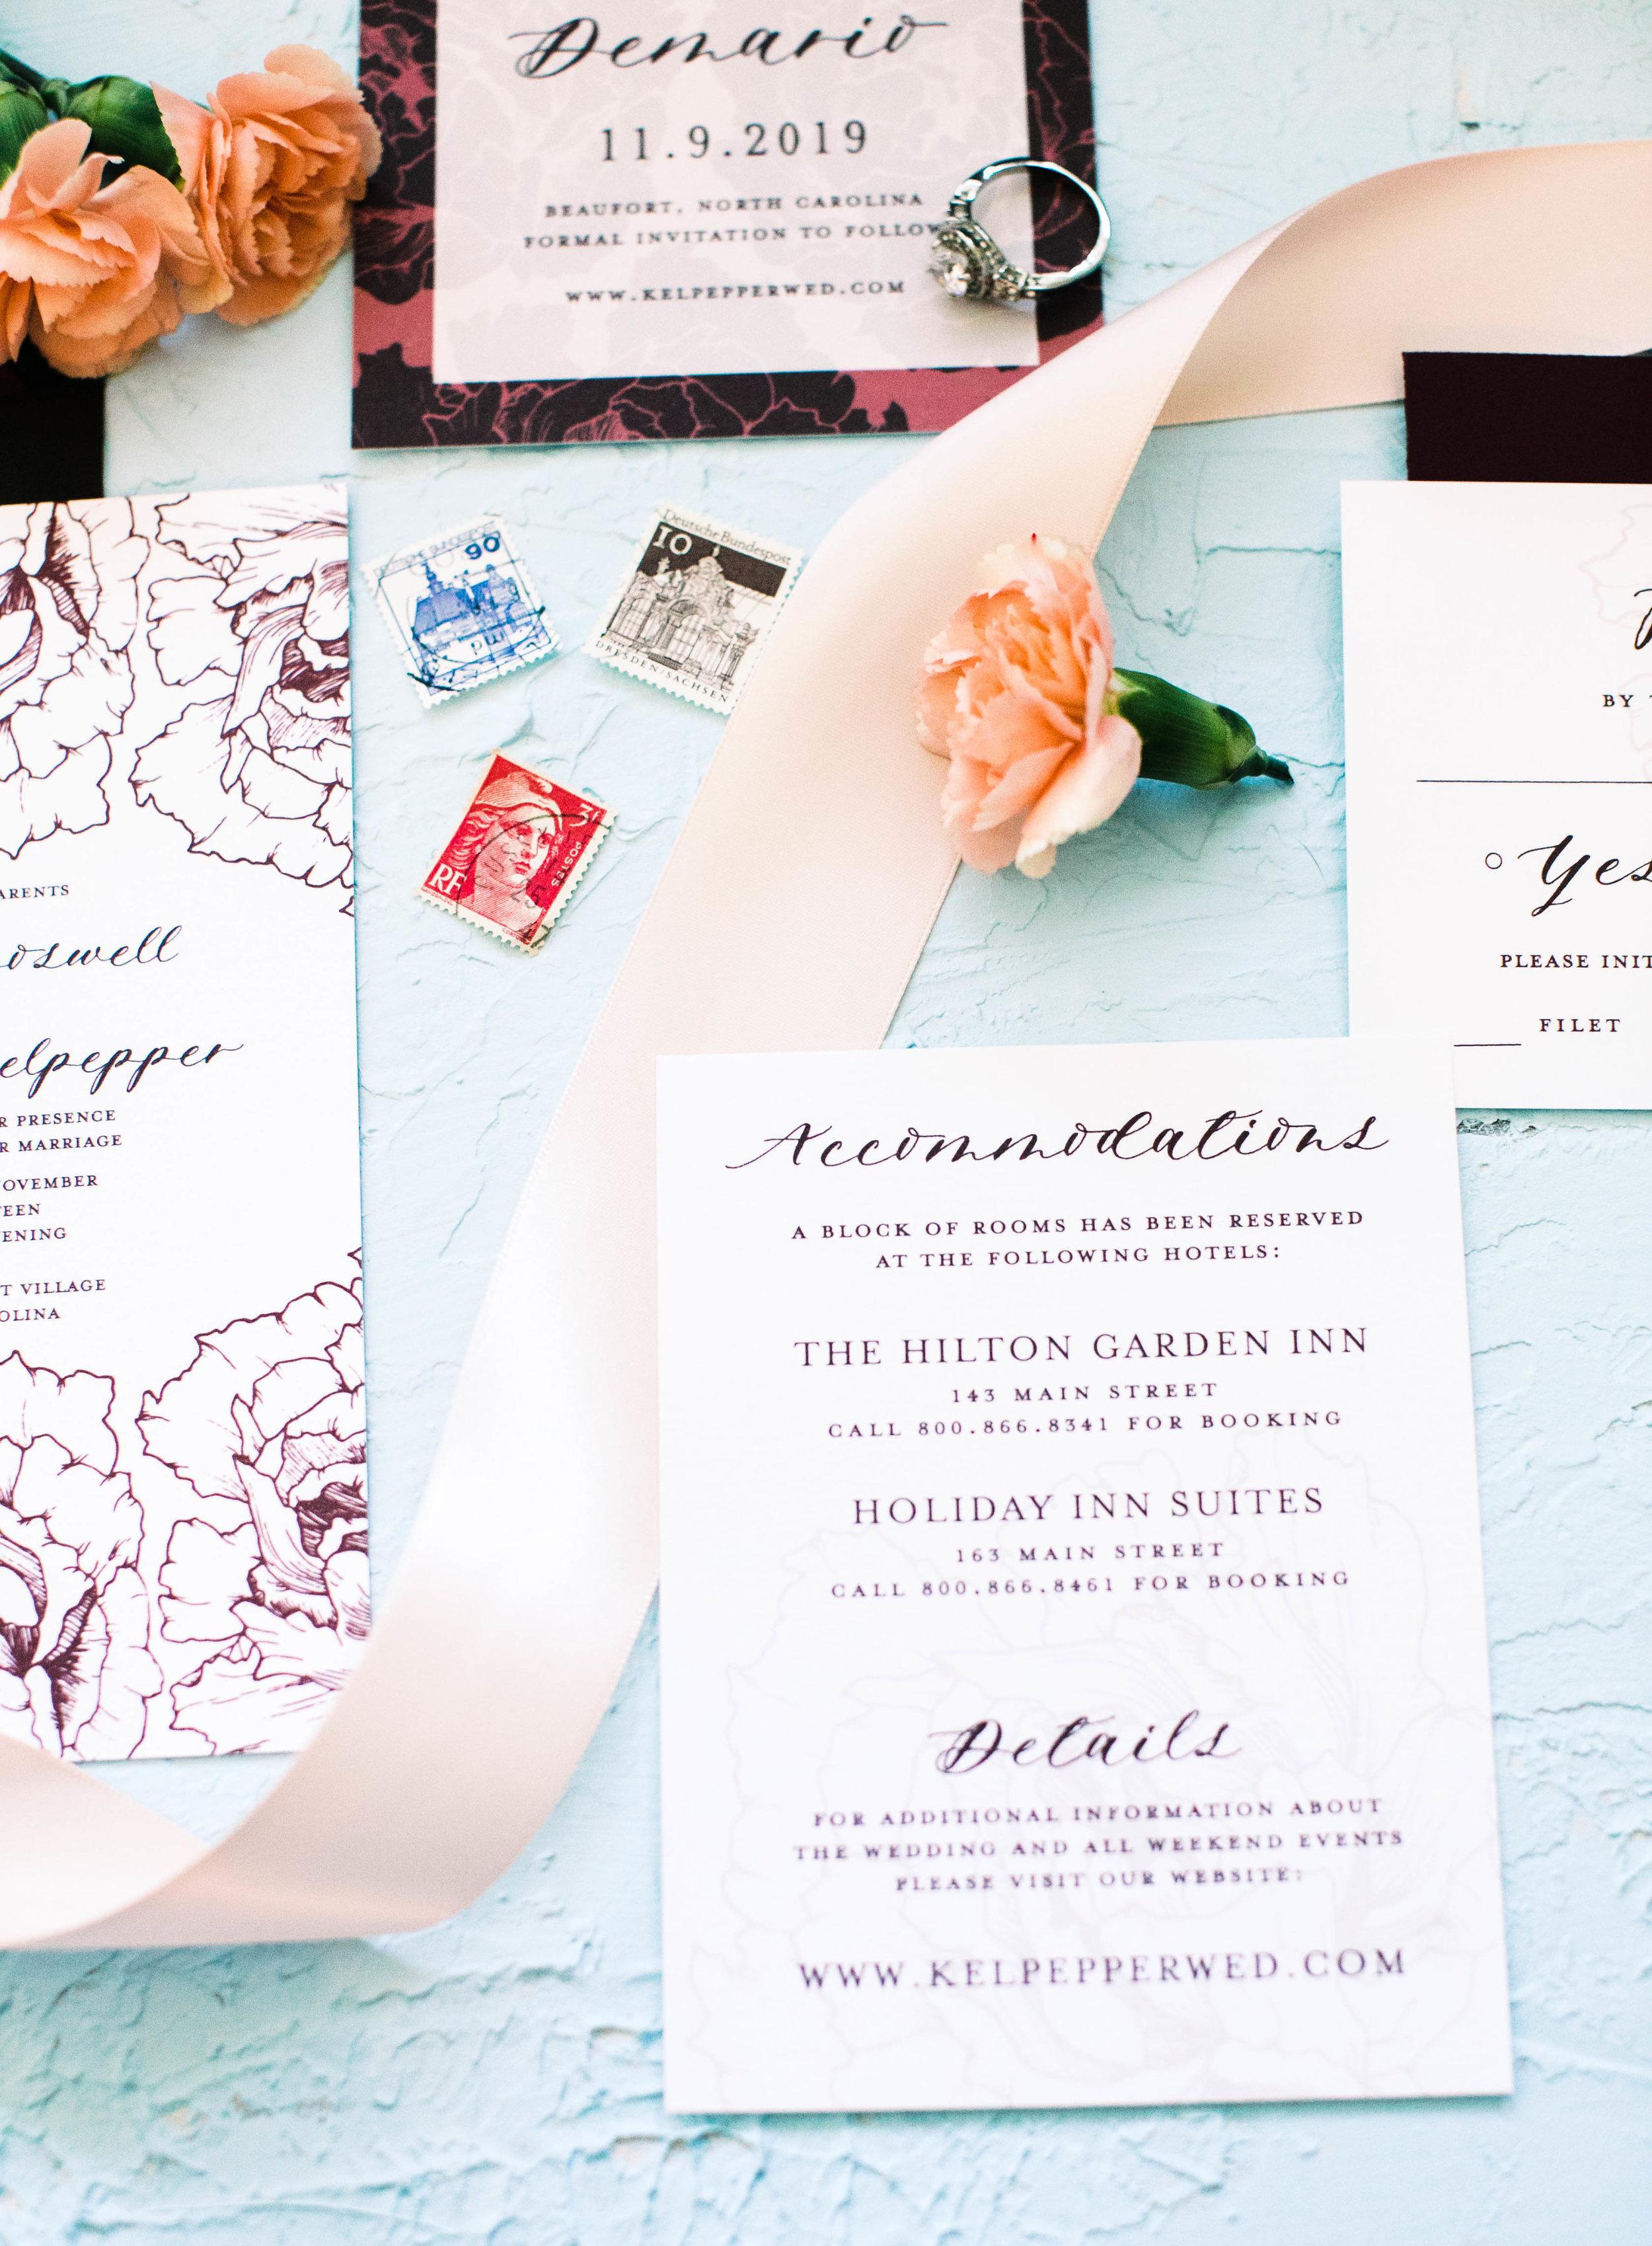 Anna Hand Drawn Wedding Invitation Burgundy Peonies Feathered Heart PrintsAnna 3W2A0366.jpg